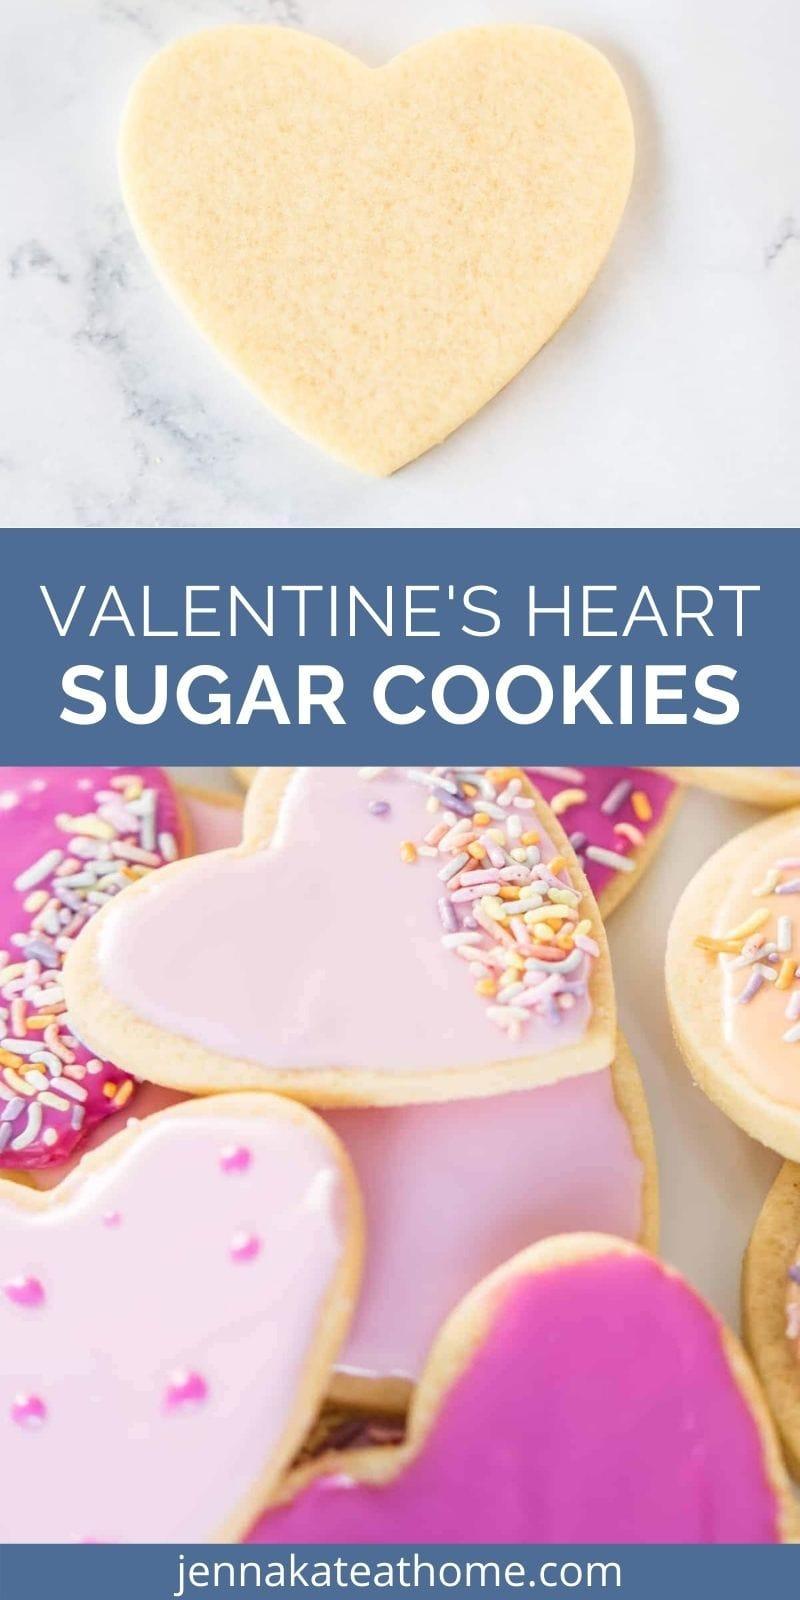 Valentine's Heart Sugar Cookies